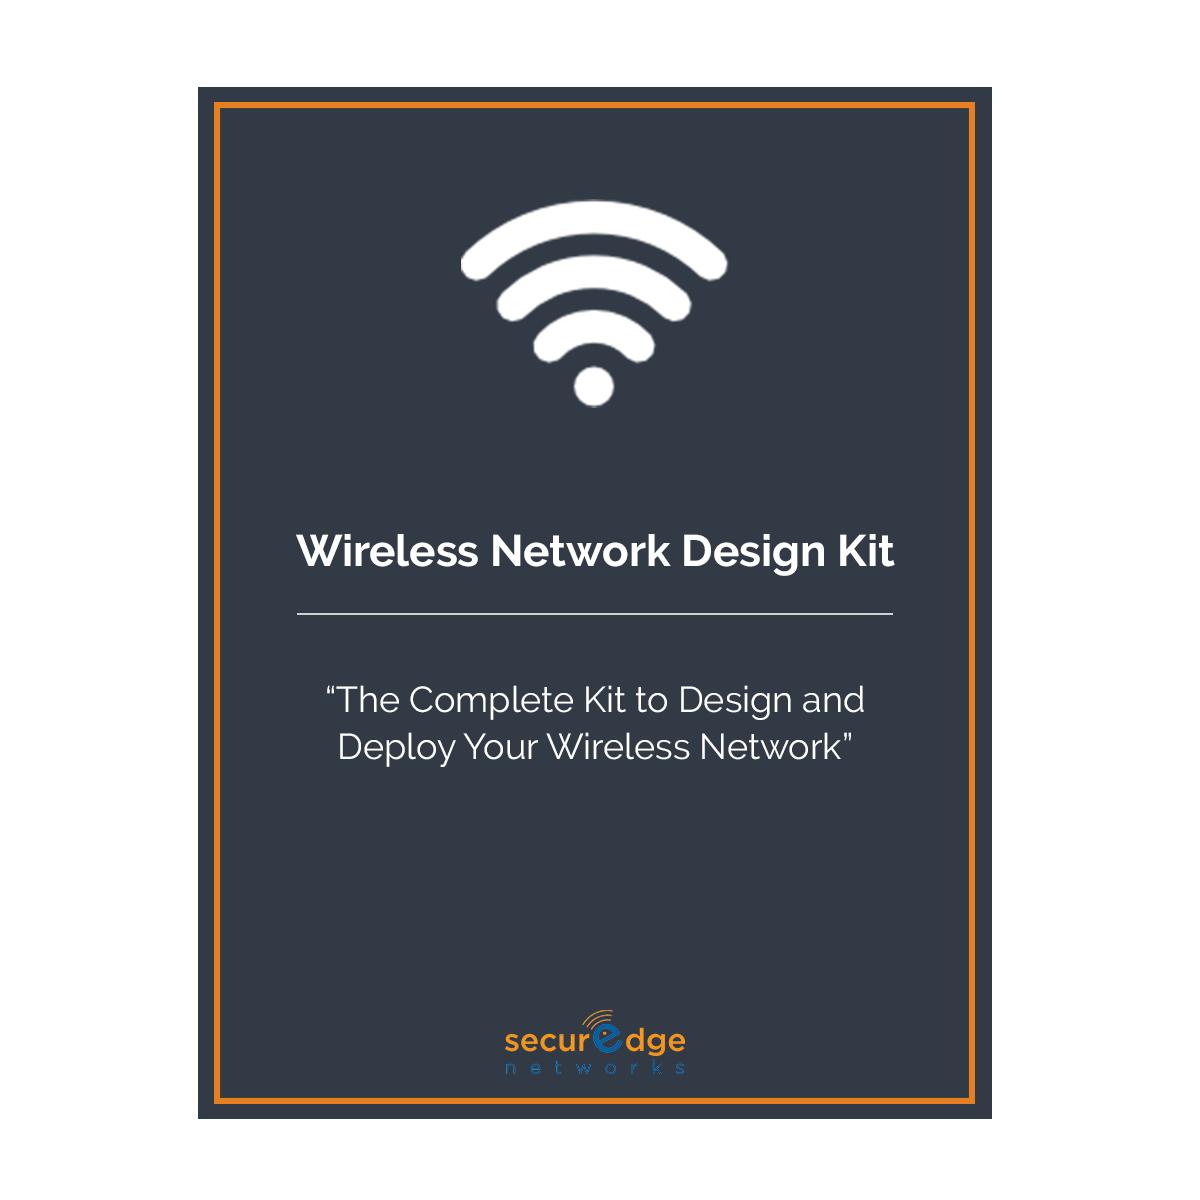 Wireless Network Design Kit